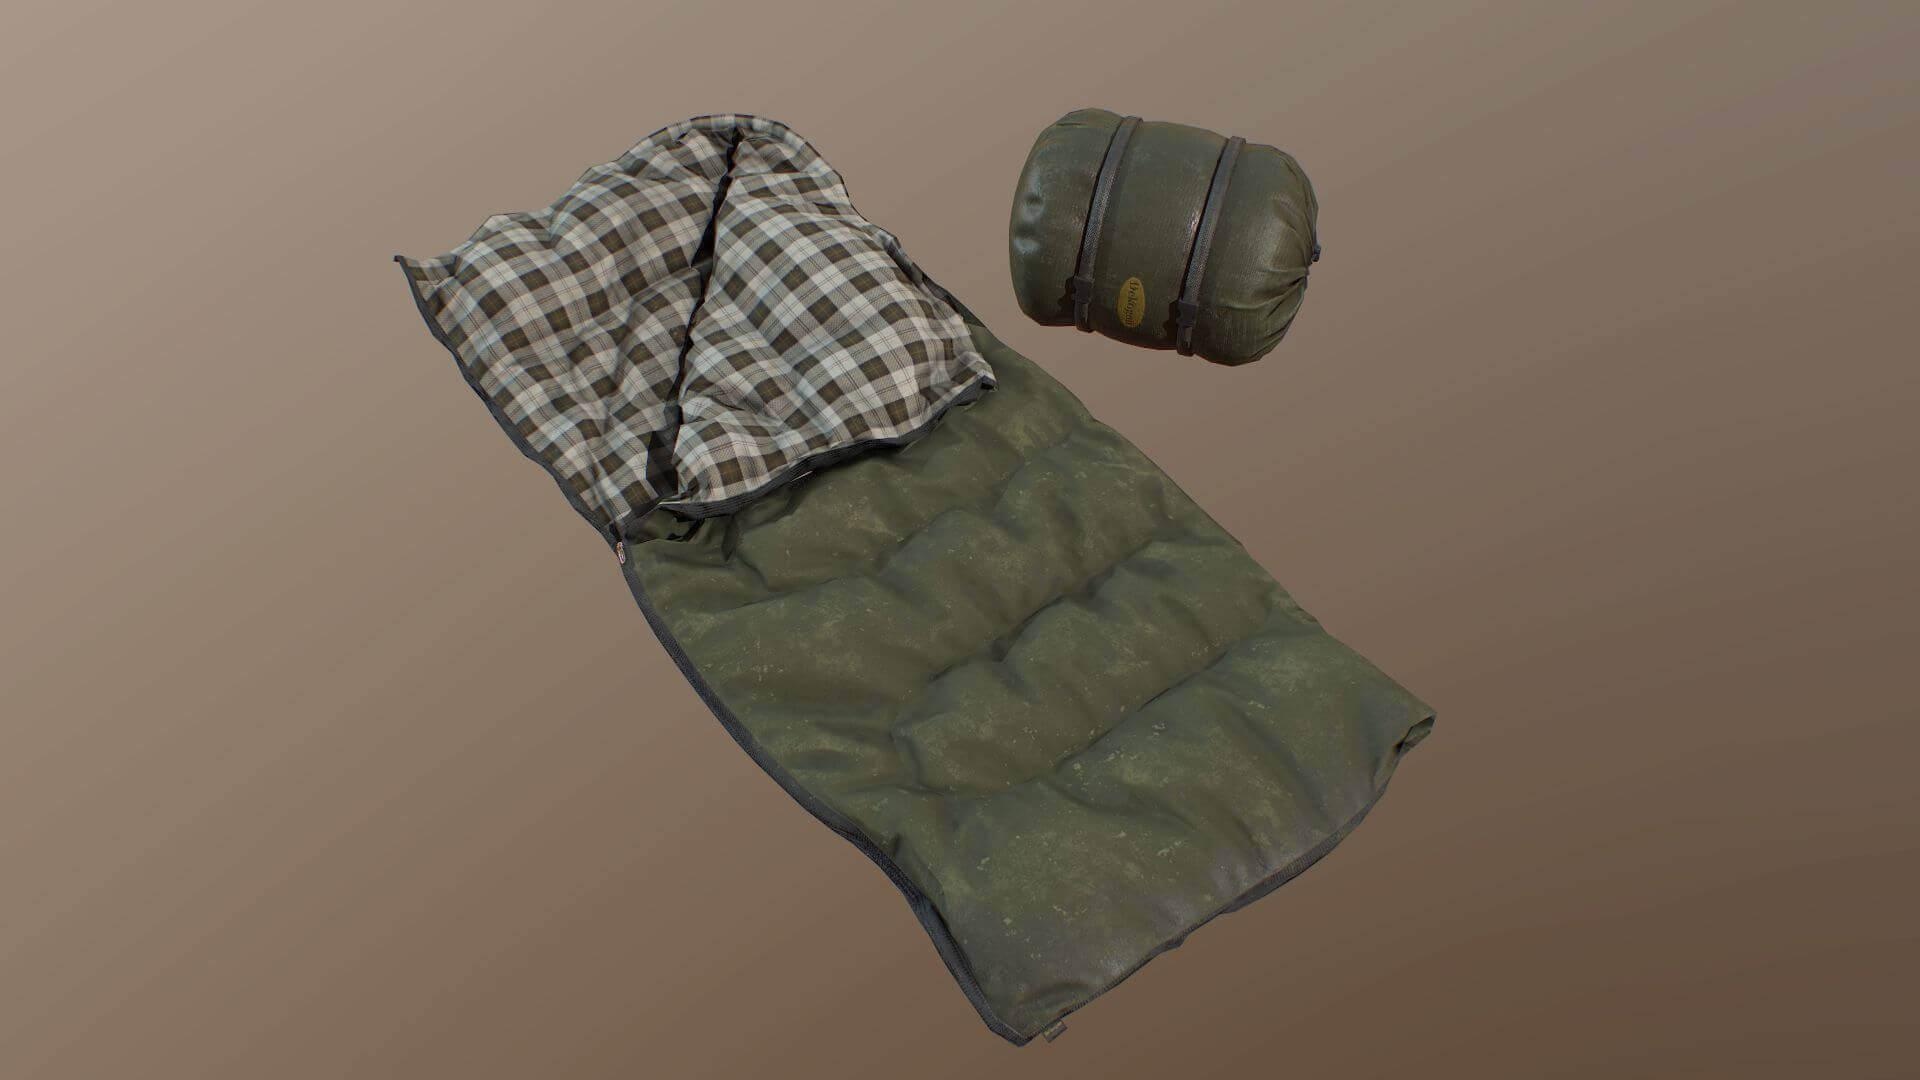 Sleeping Bag Green 3d Model